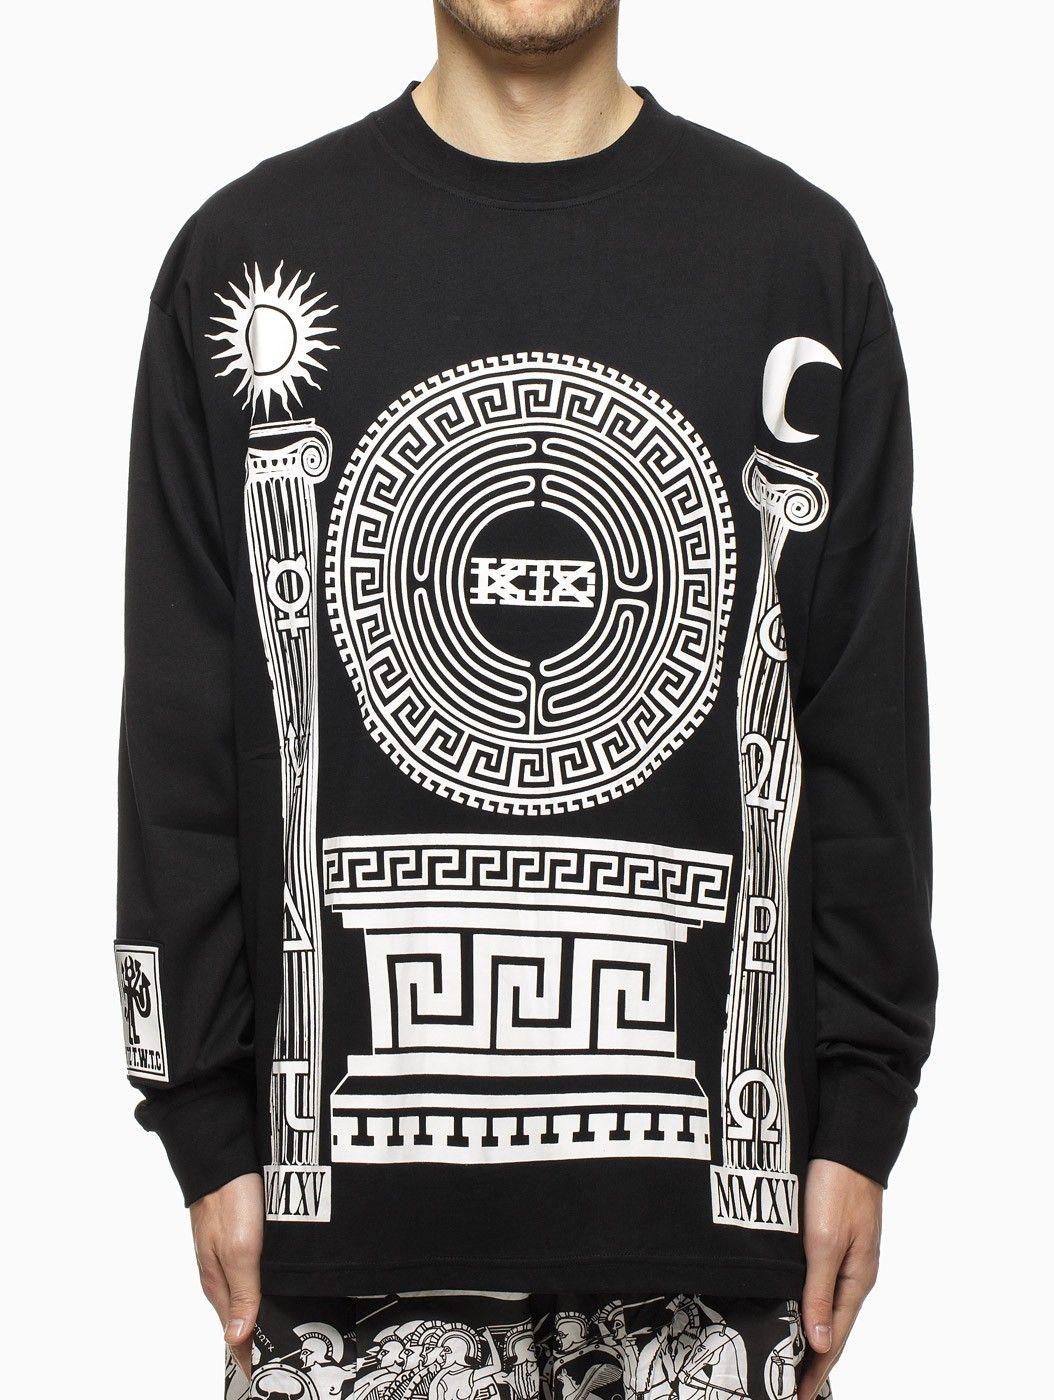 Long sleeve t-shirt from S/S2015 KTZ Kokon To Zai collection in black